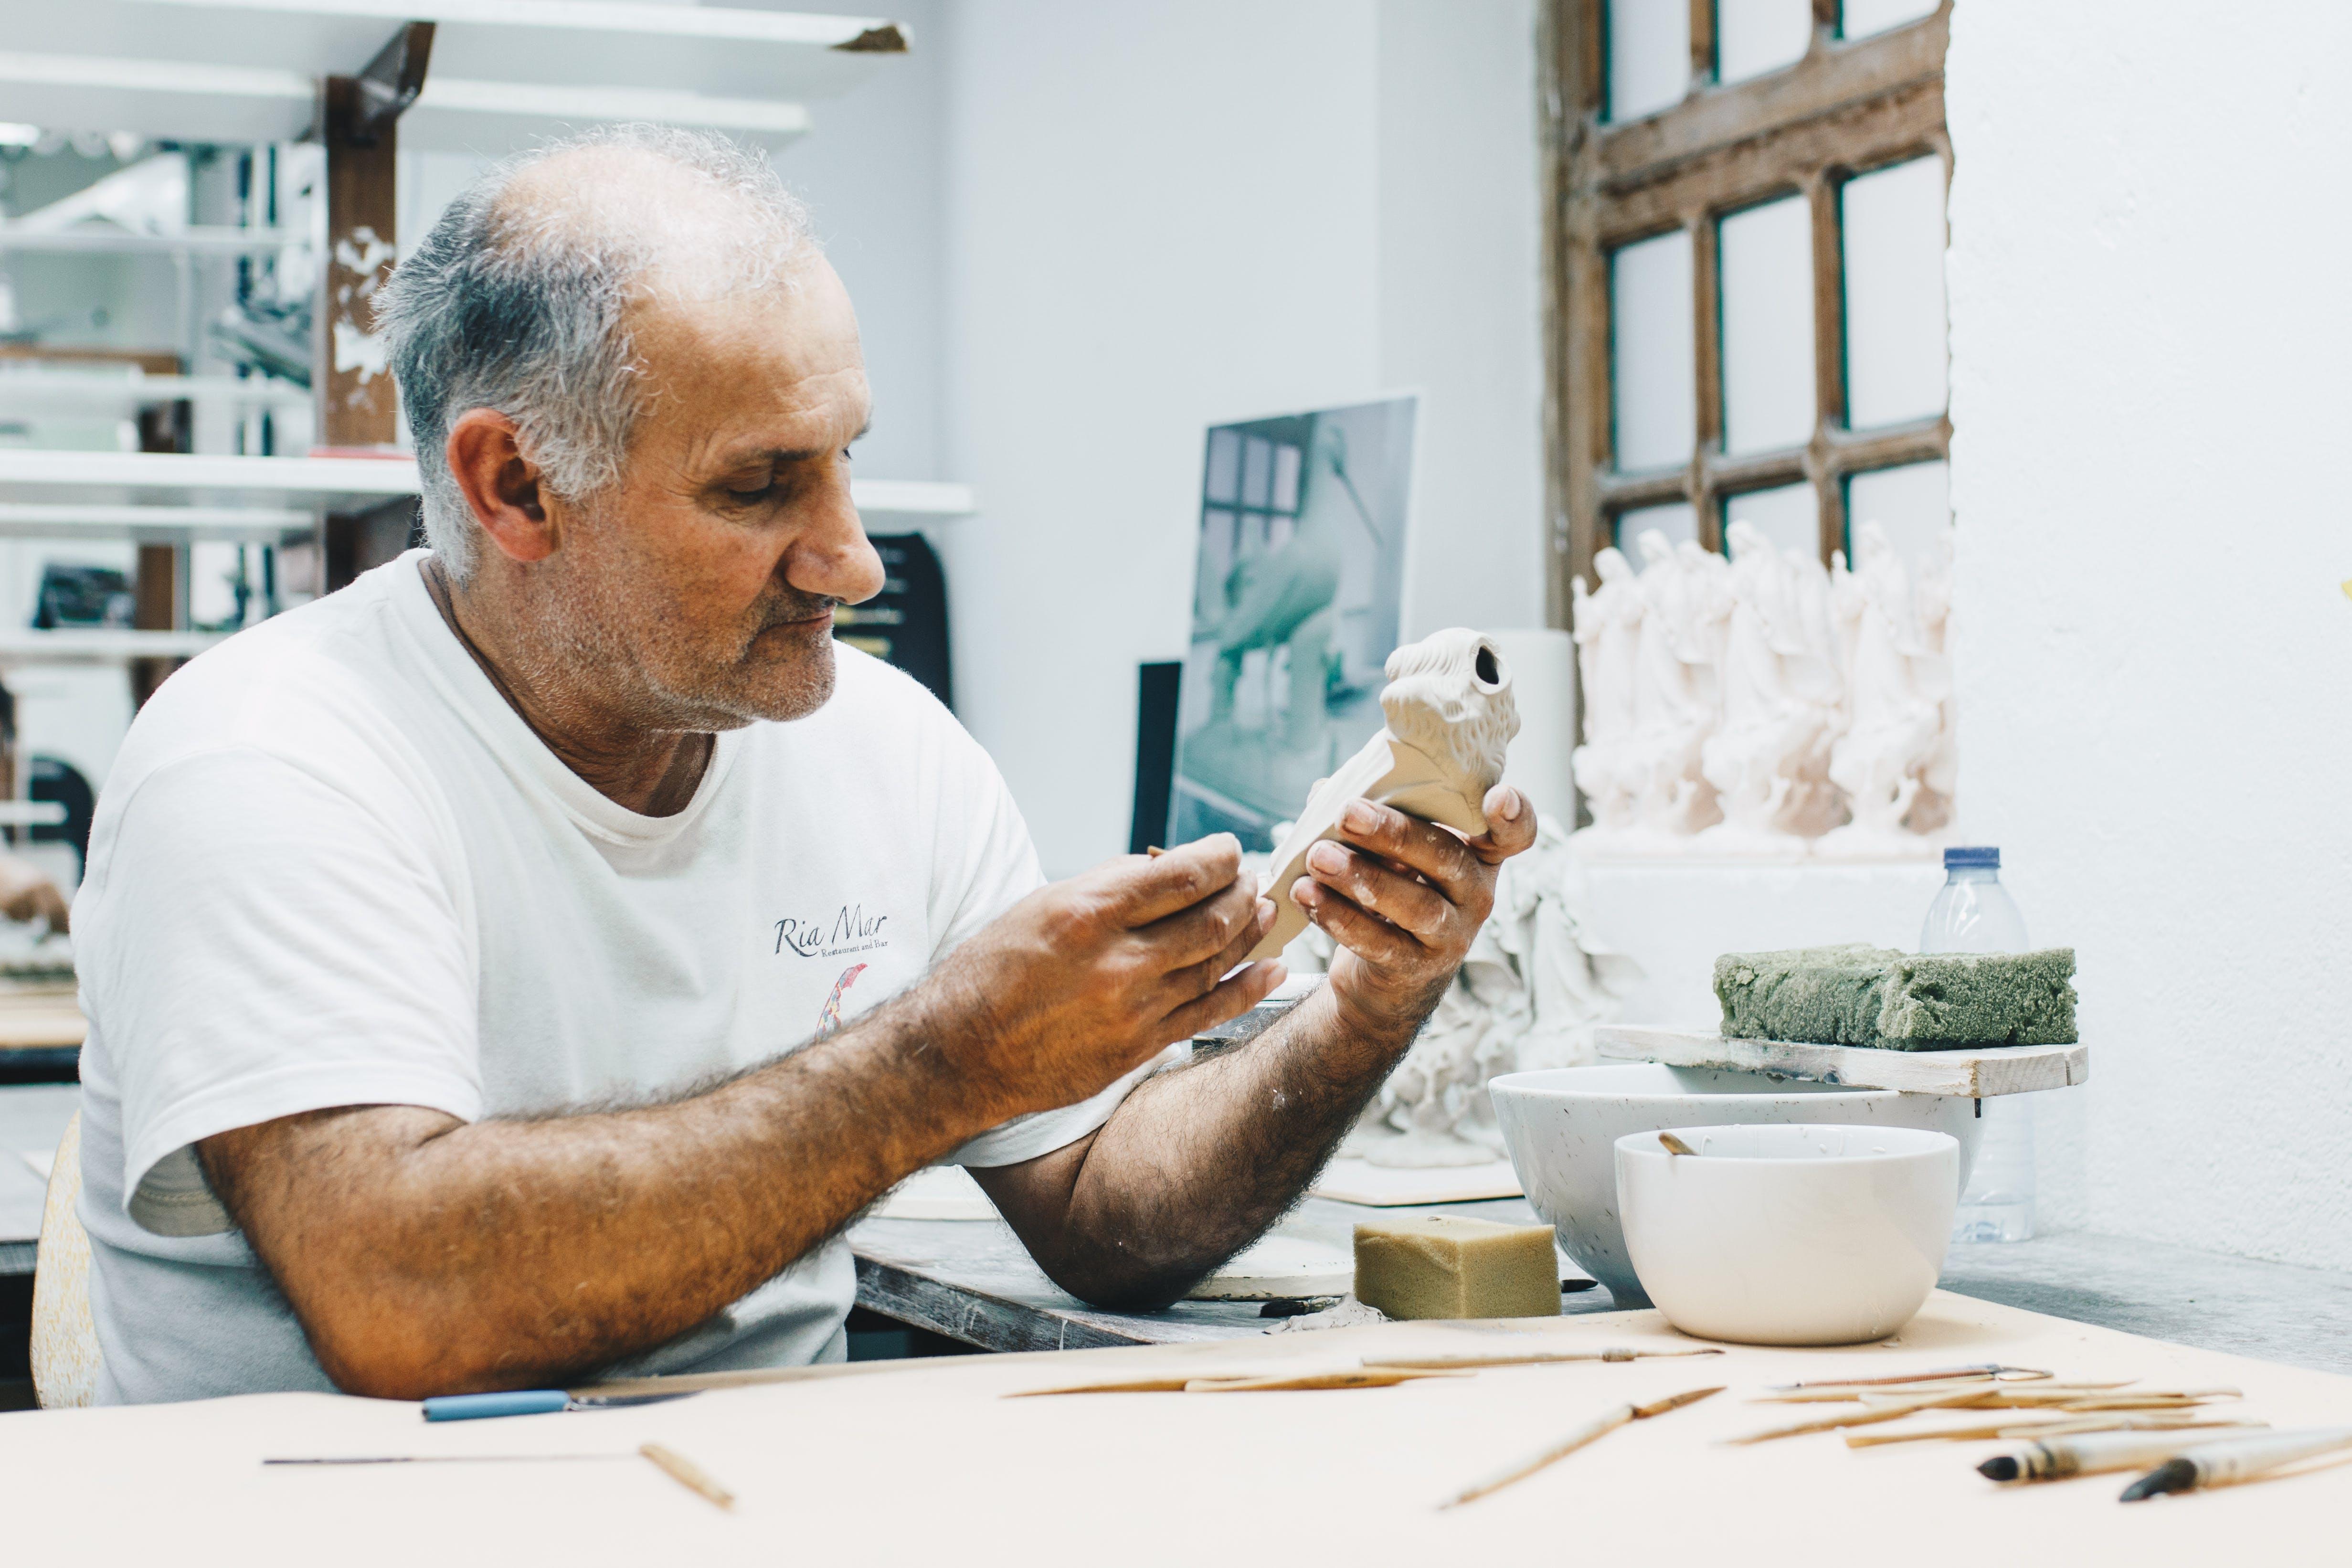 Man in White Crew-neck T-shirt Holding White Figurine